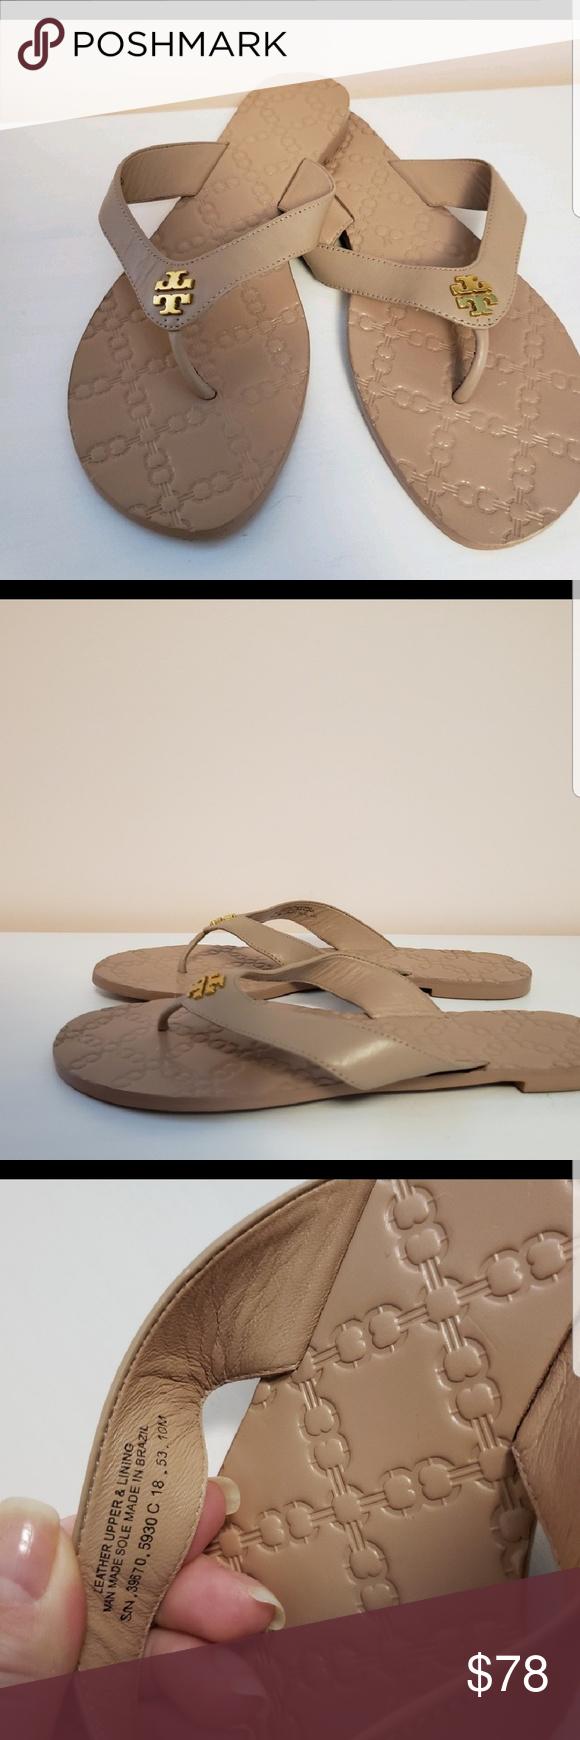 4c038b1ce Tory Burch Monroe Light Makeup Leather Thong Sanda Tory Burch Monroe Light  Makeup Leather Thong Sandals Women s Size 10M